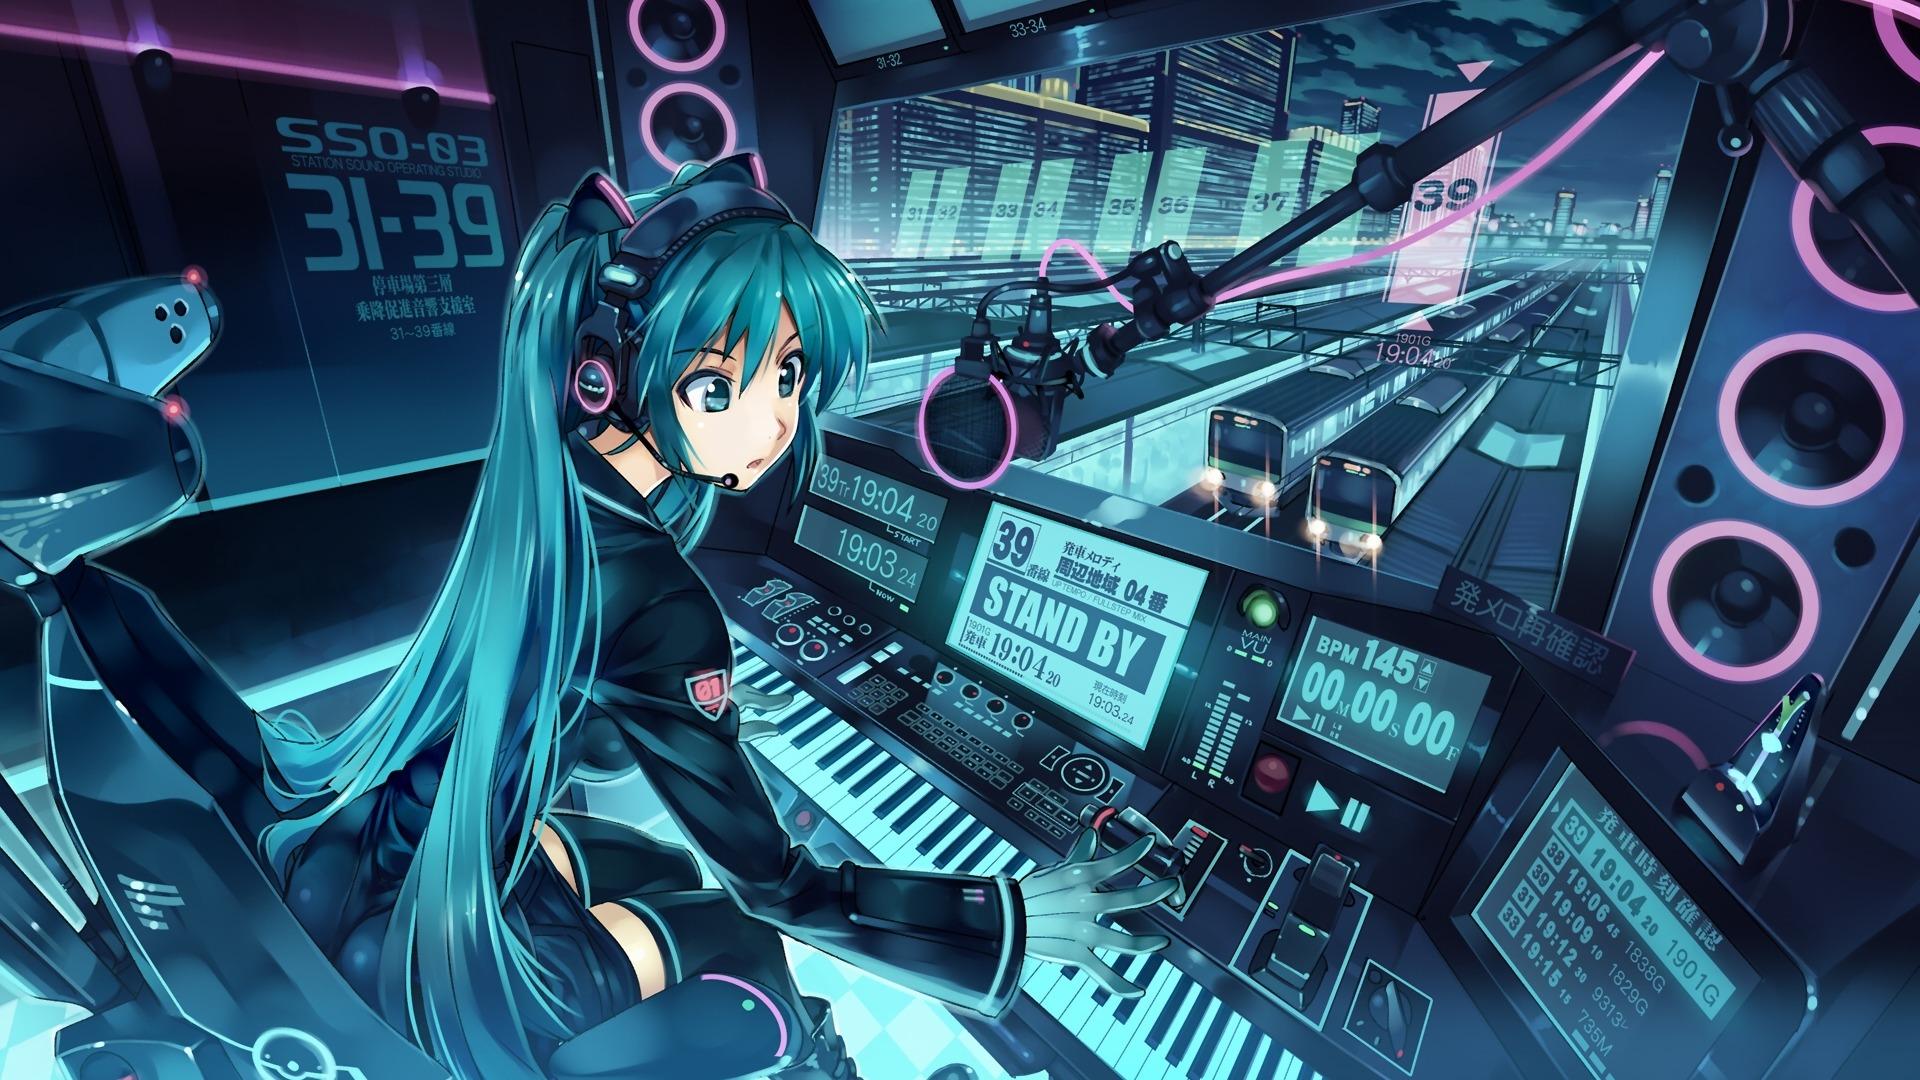 Hd wallpaper anime - Wallpapers 26592 Anime Girl Train Station Operator